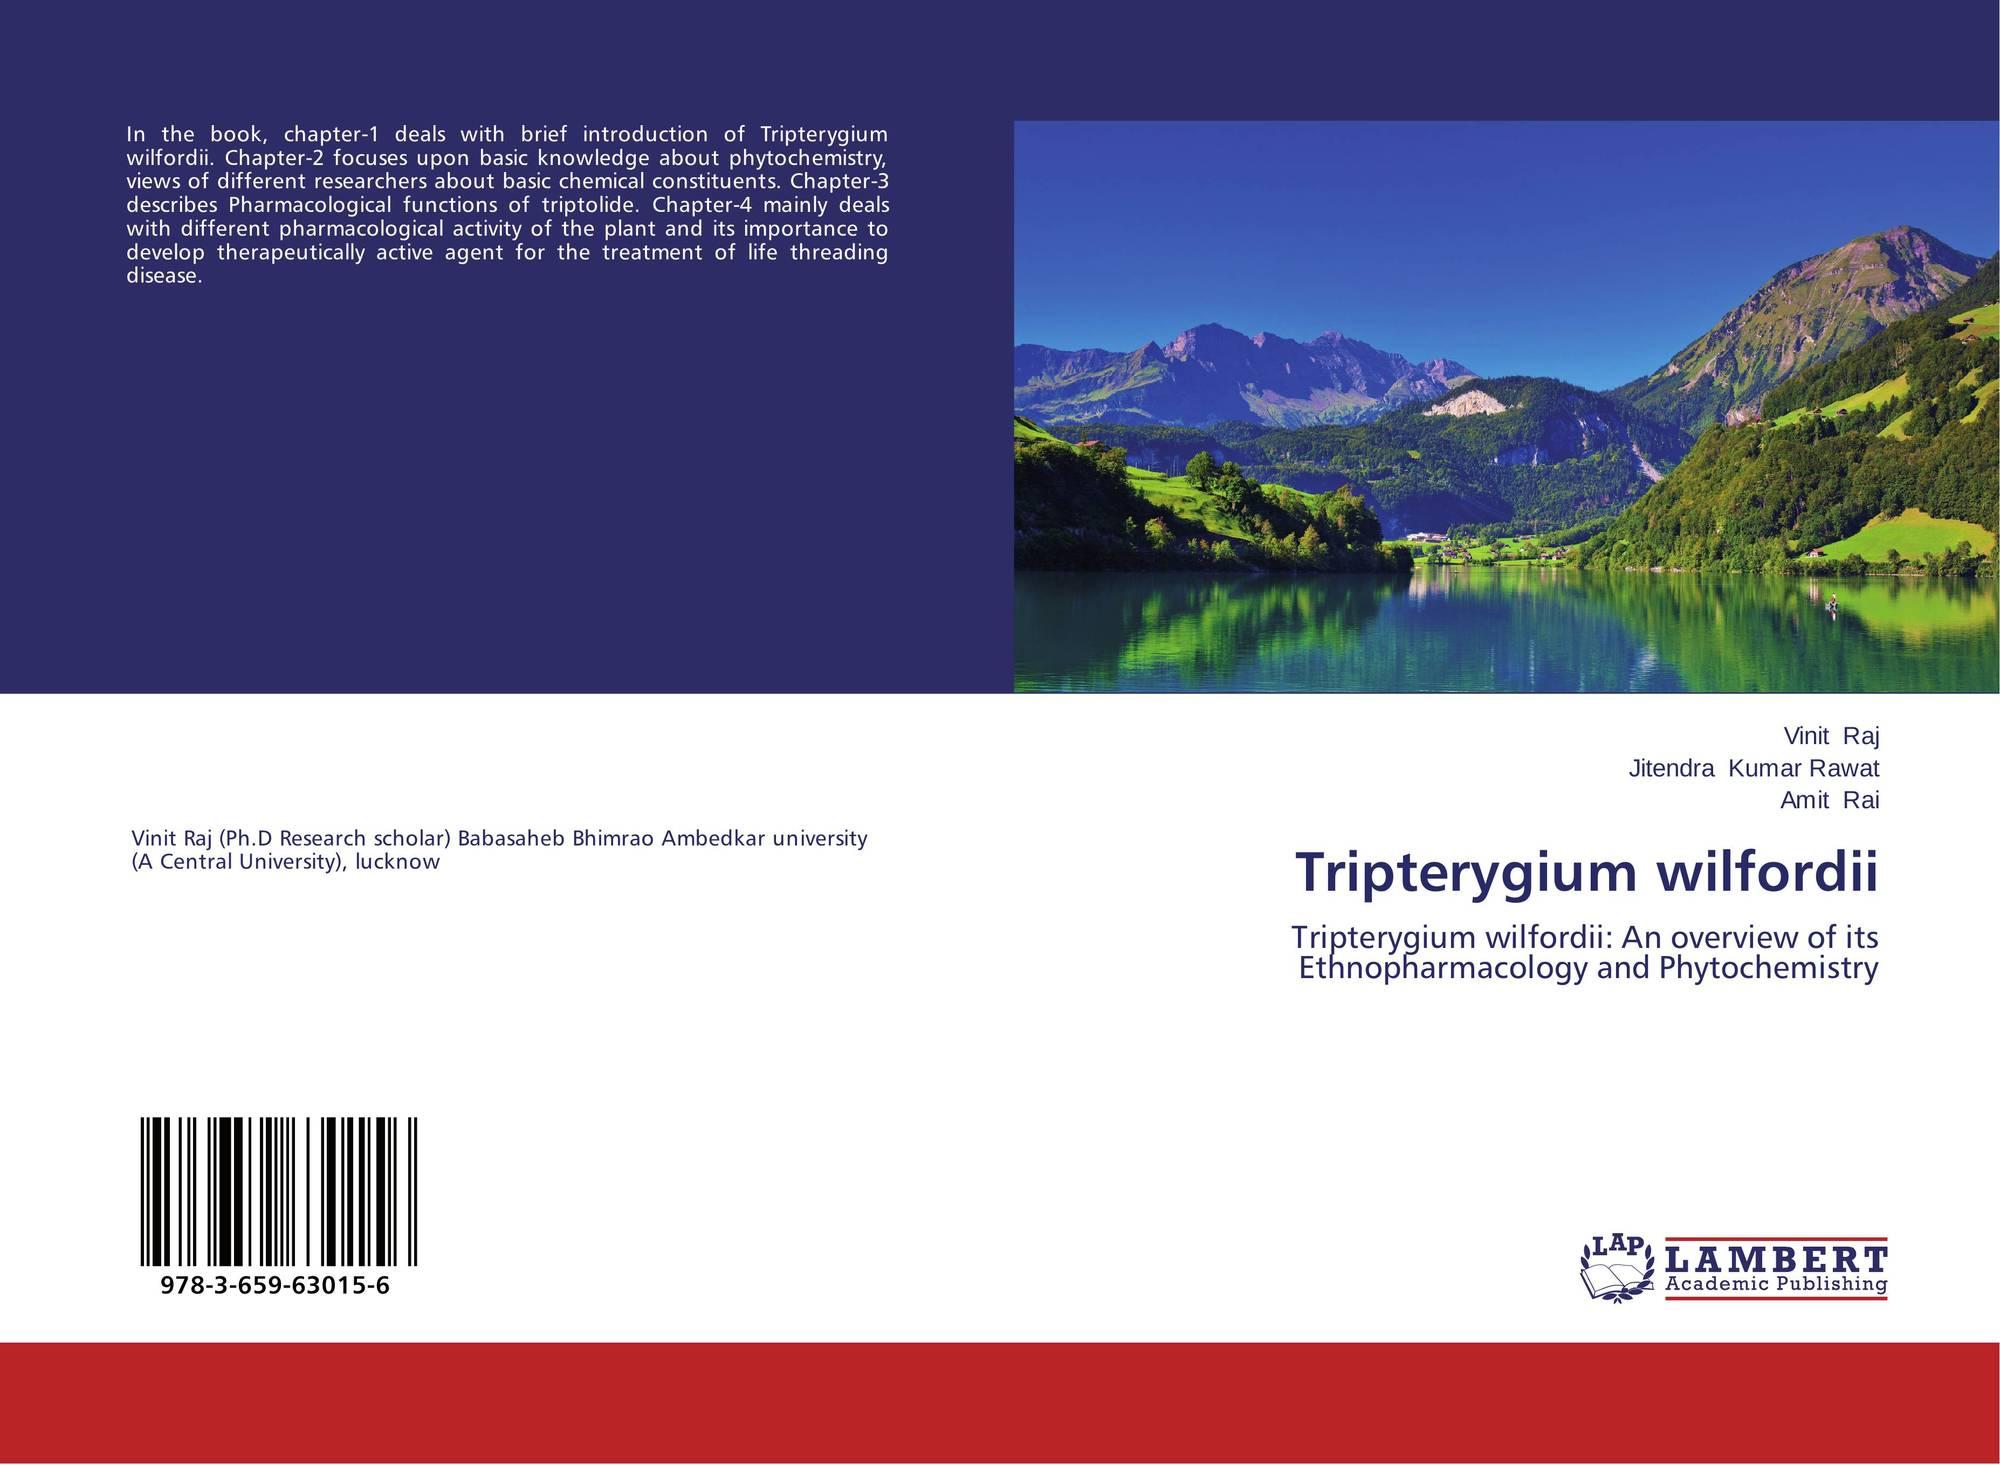 Tripterygium wilfordii, 978-3-659-63015-6, 3659630152